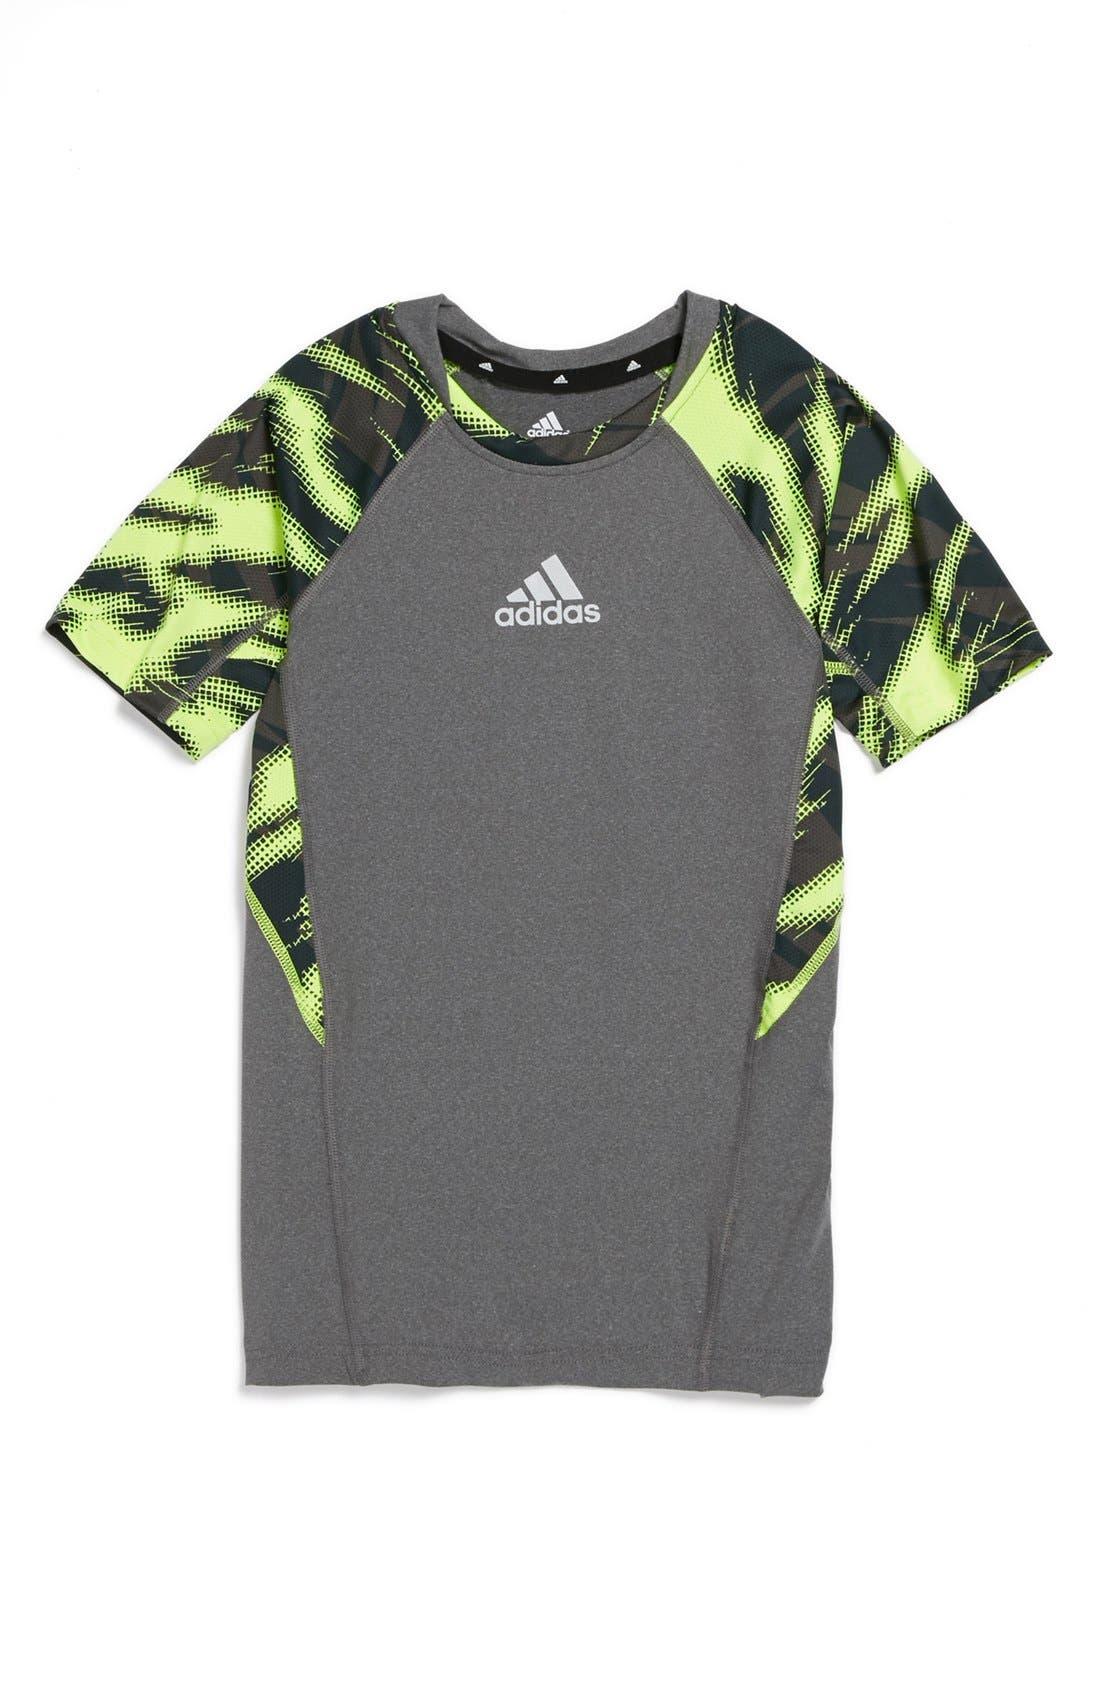 Alternate Image 1 Selected - adidas Tech Fit Performance T-Shirt (Big Boys)